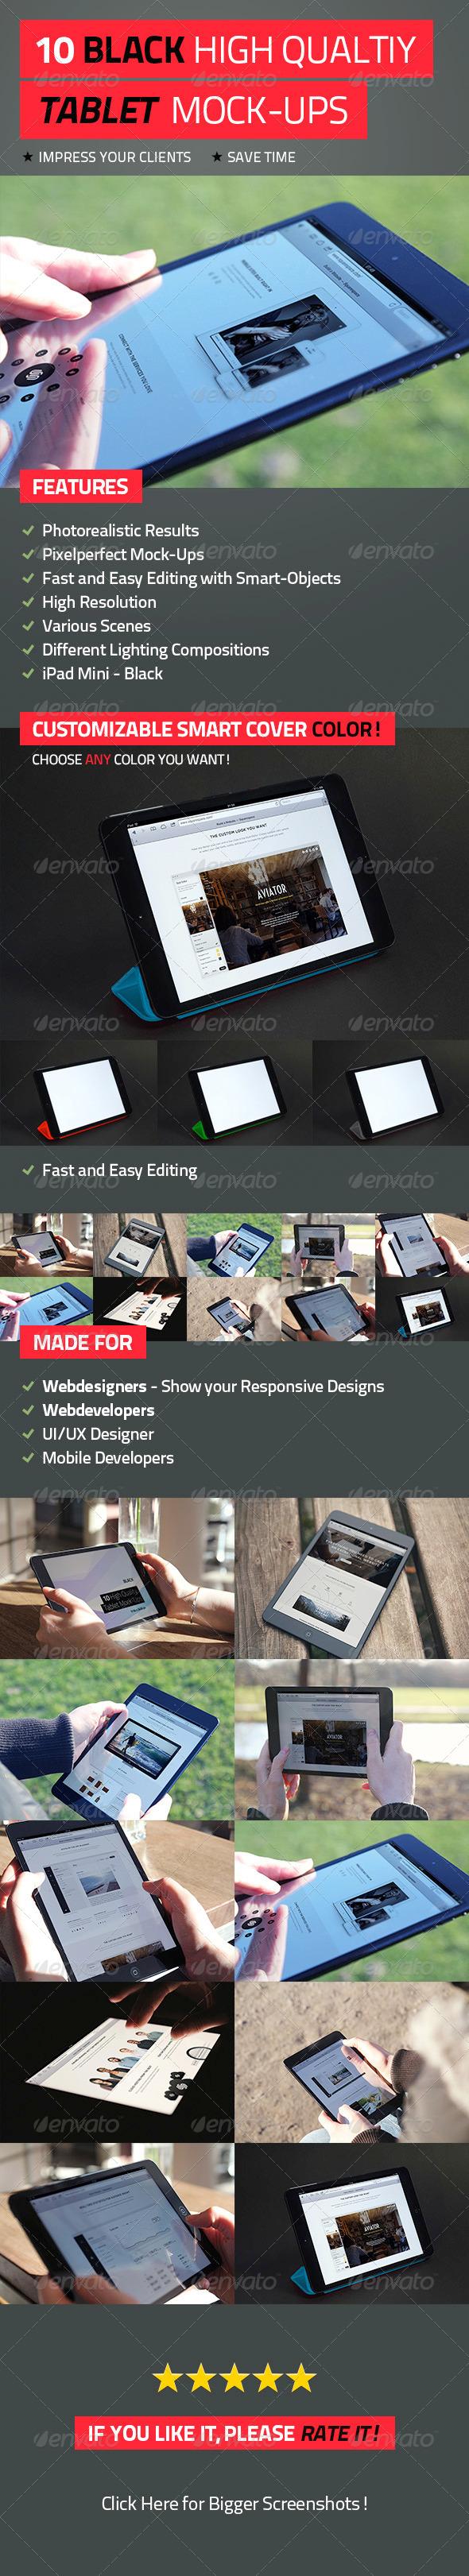 GraphicRiver 10 Black High Quality Tablet Mock-Ups 4596268